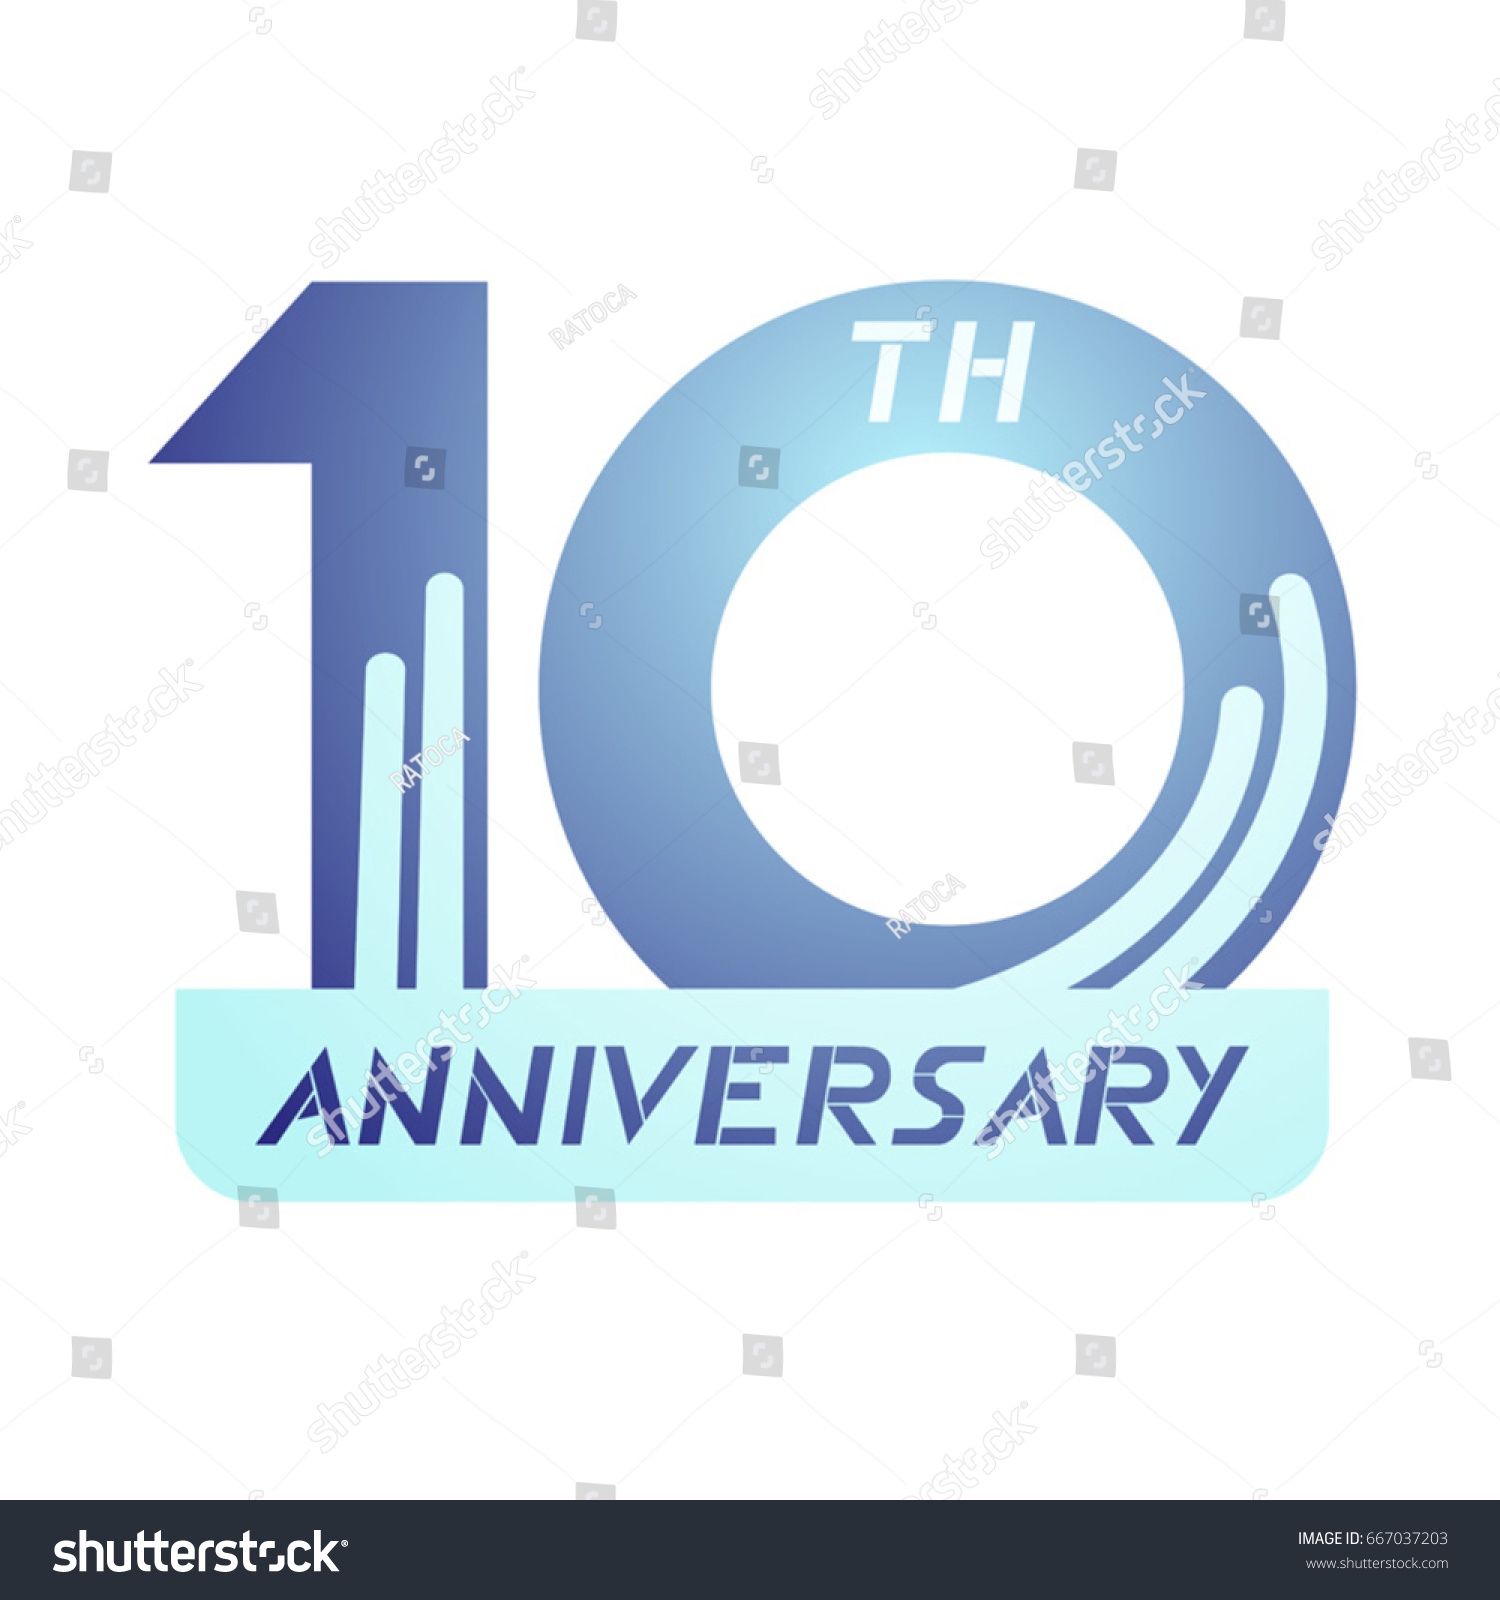 10th anniversary symbol stock vector 667037203 shutterstock 10th anniversary symbol biocorpaavc